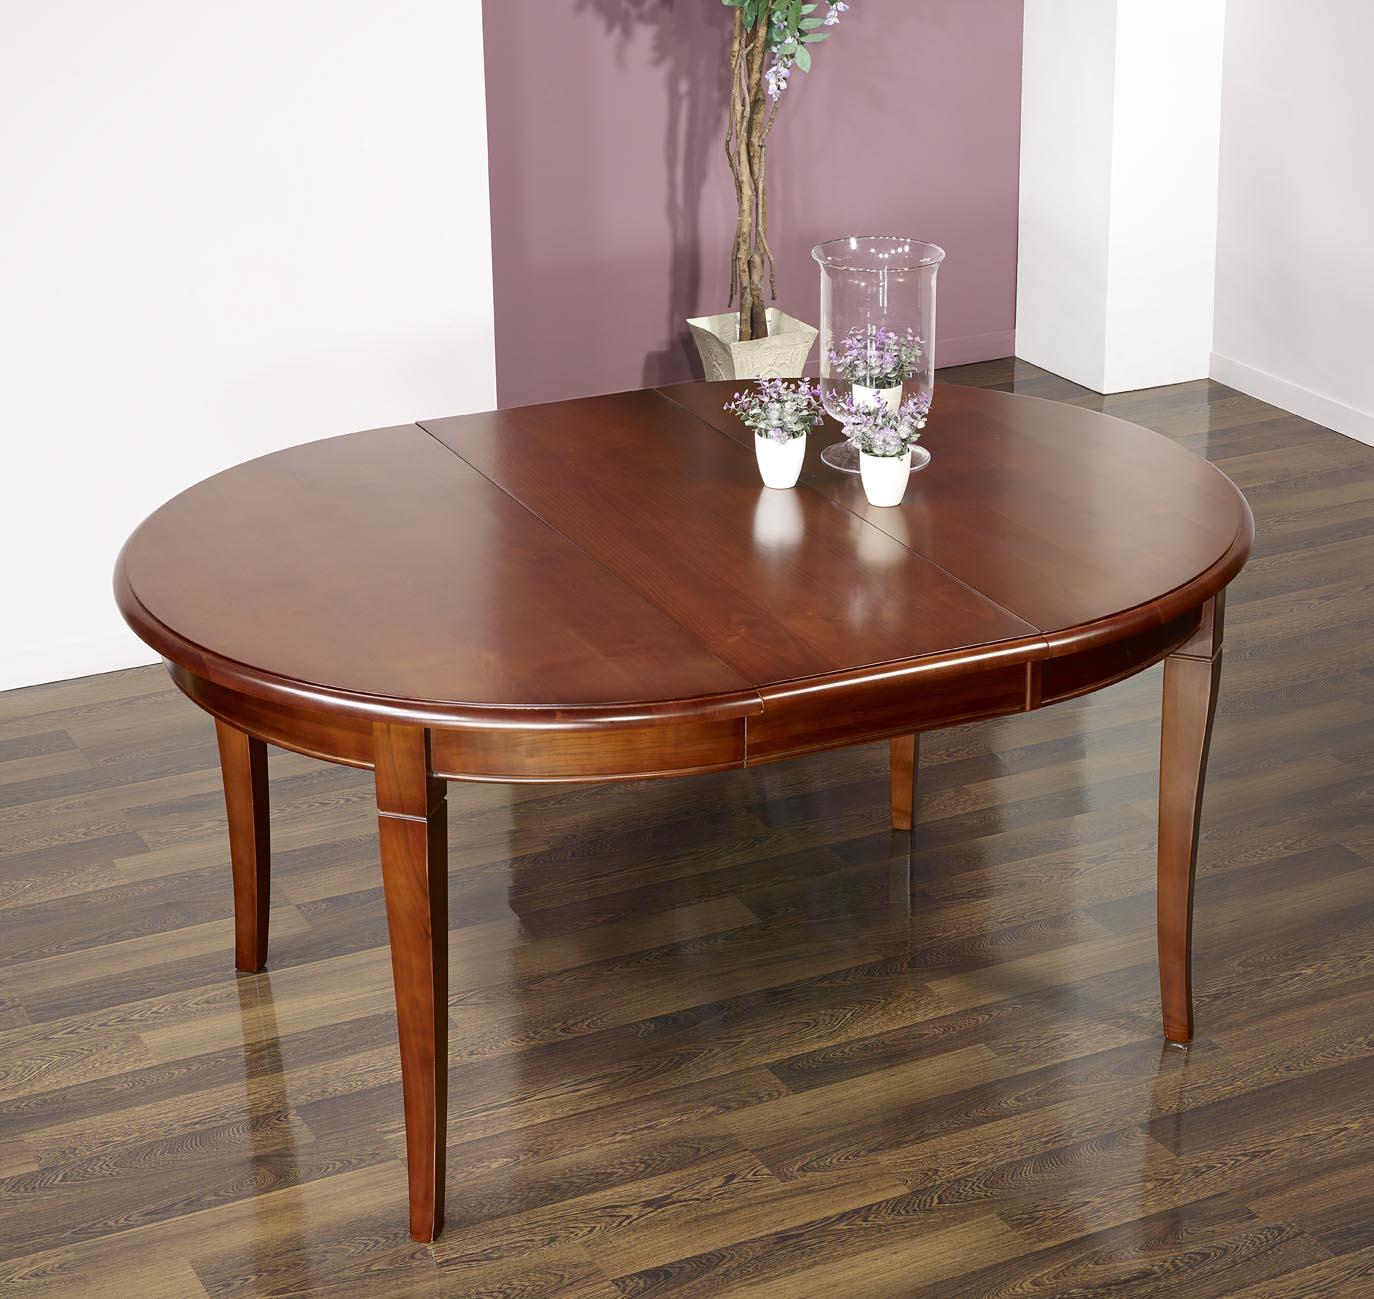 Table ronde 4 pieds sabres en merisier massif de style - Diametre table ronde 4 personnes ...